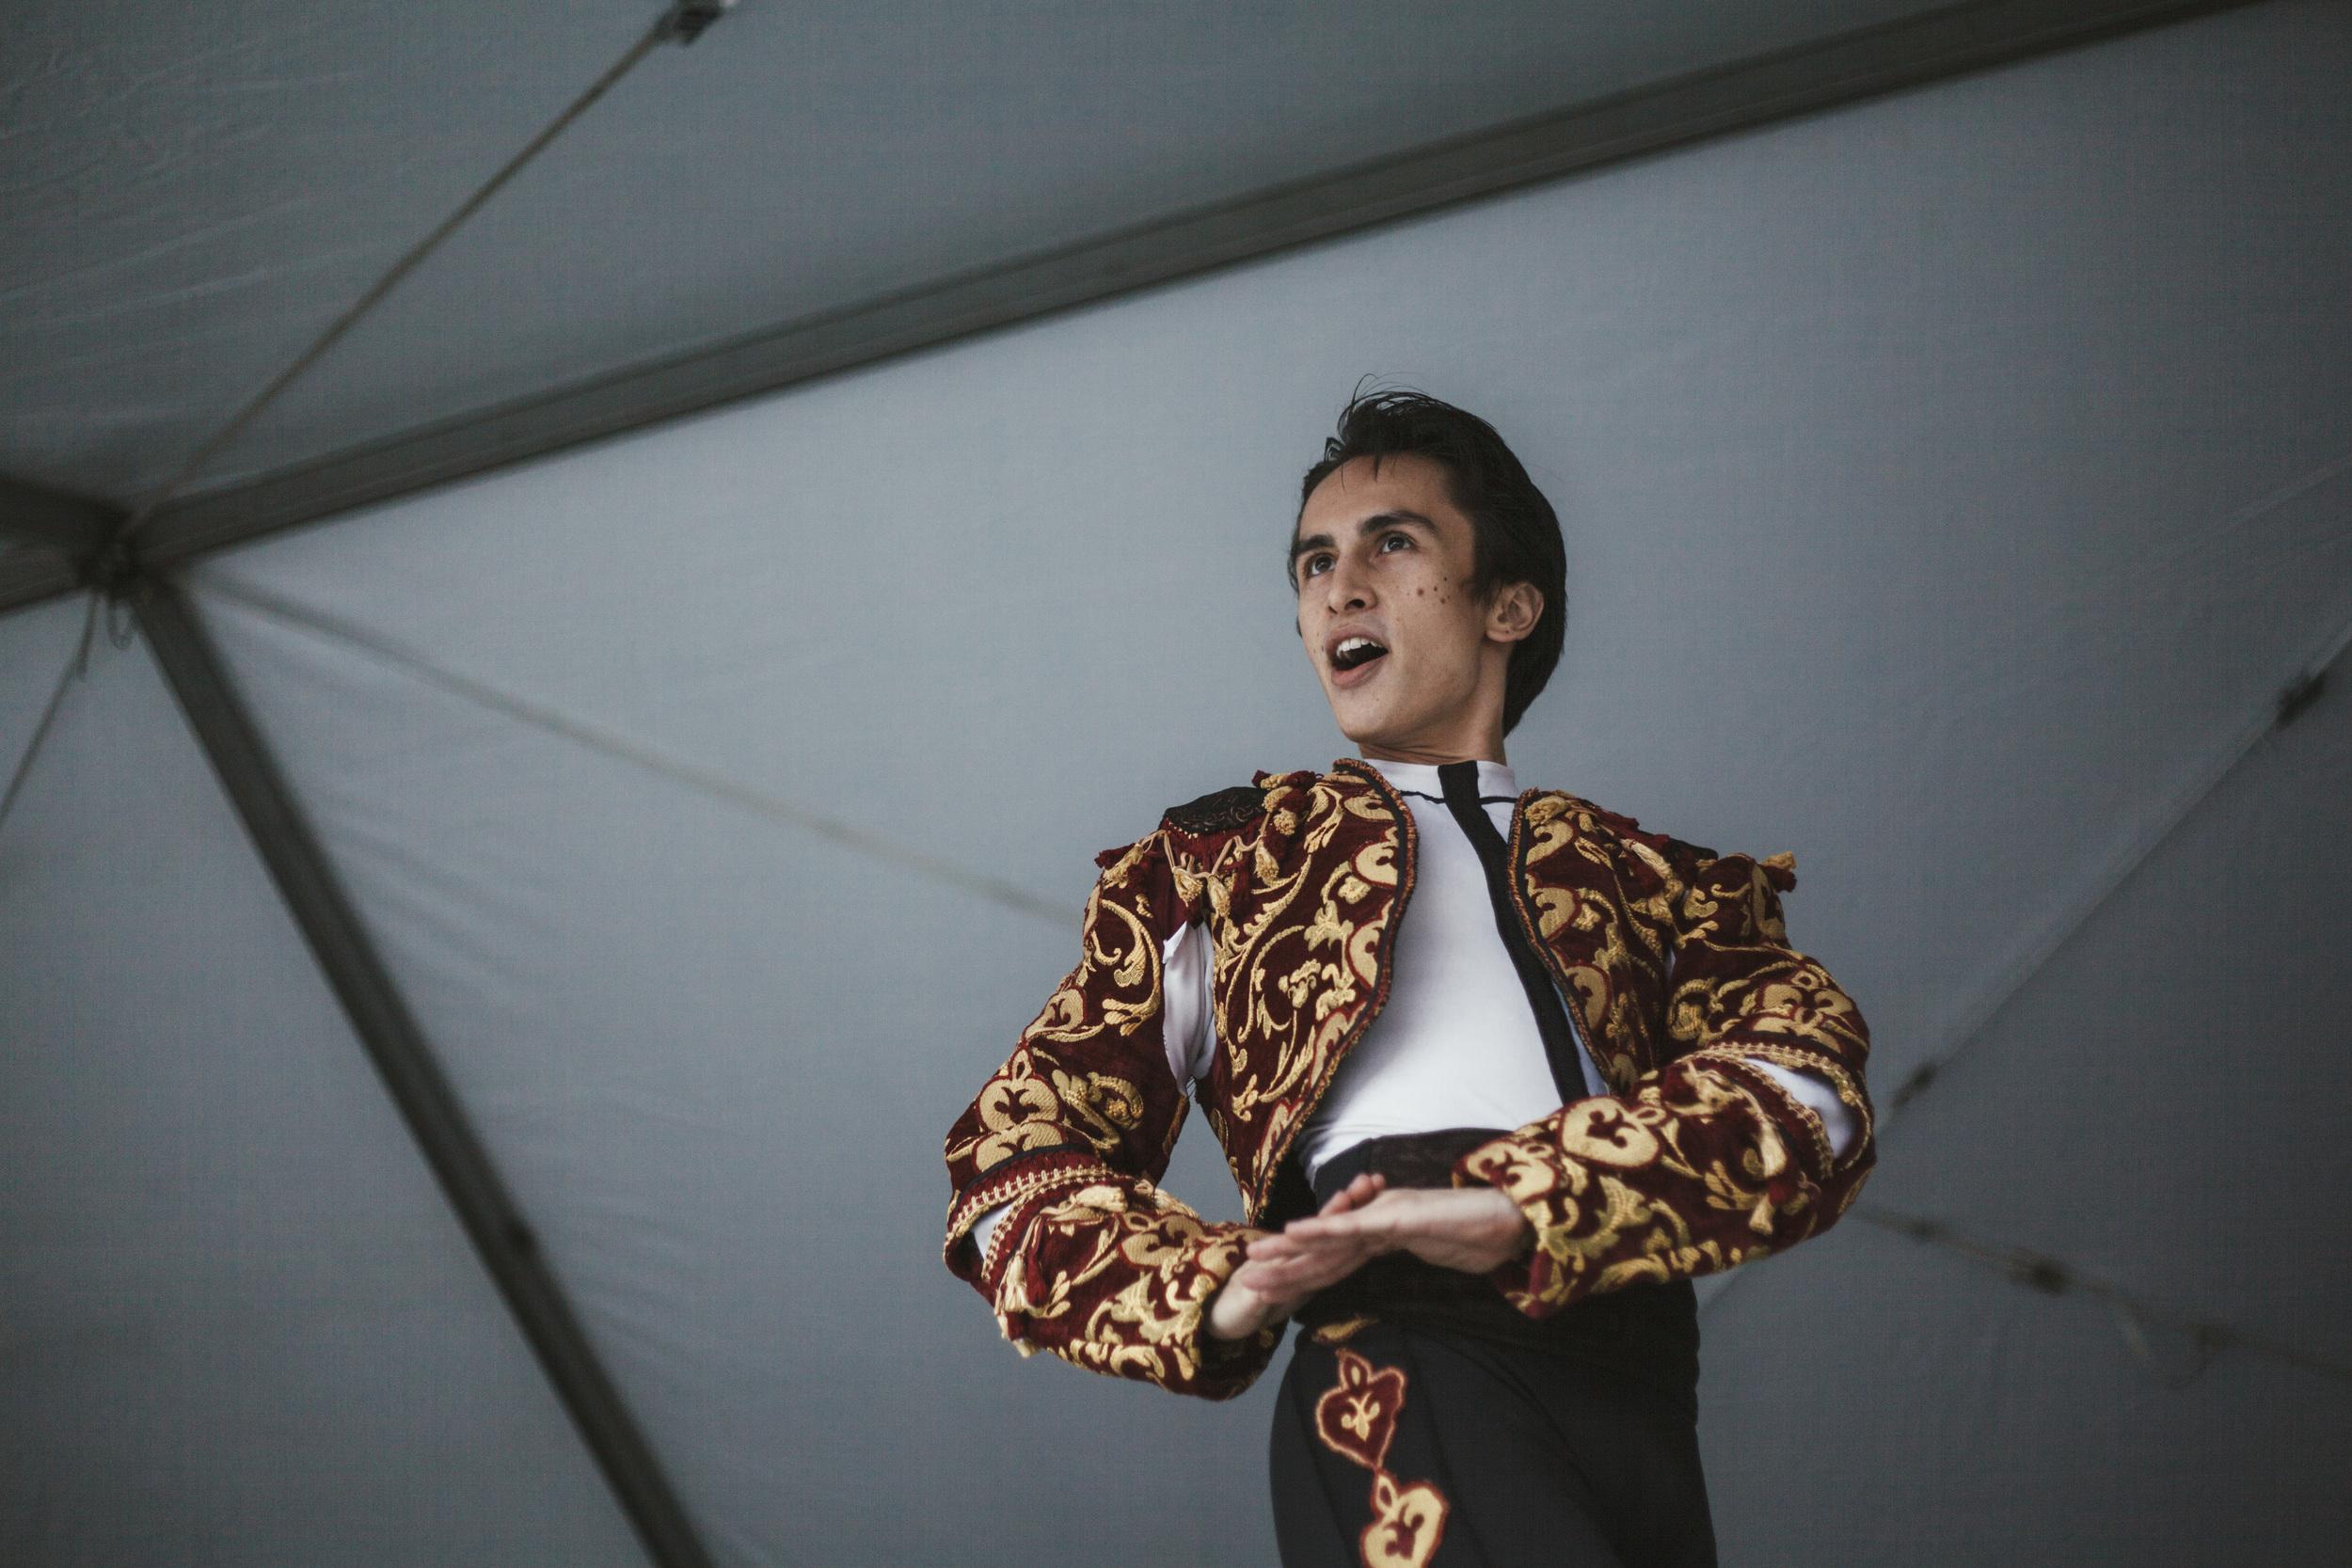 Bozzuto Fall Festival - Performances-53.JPG